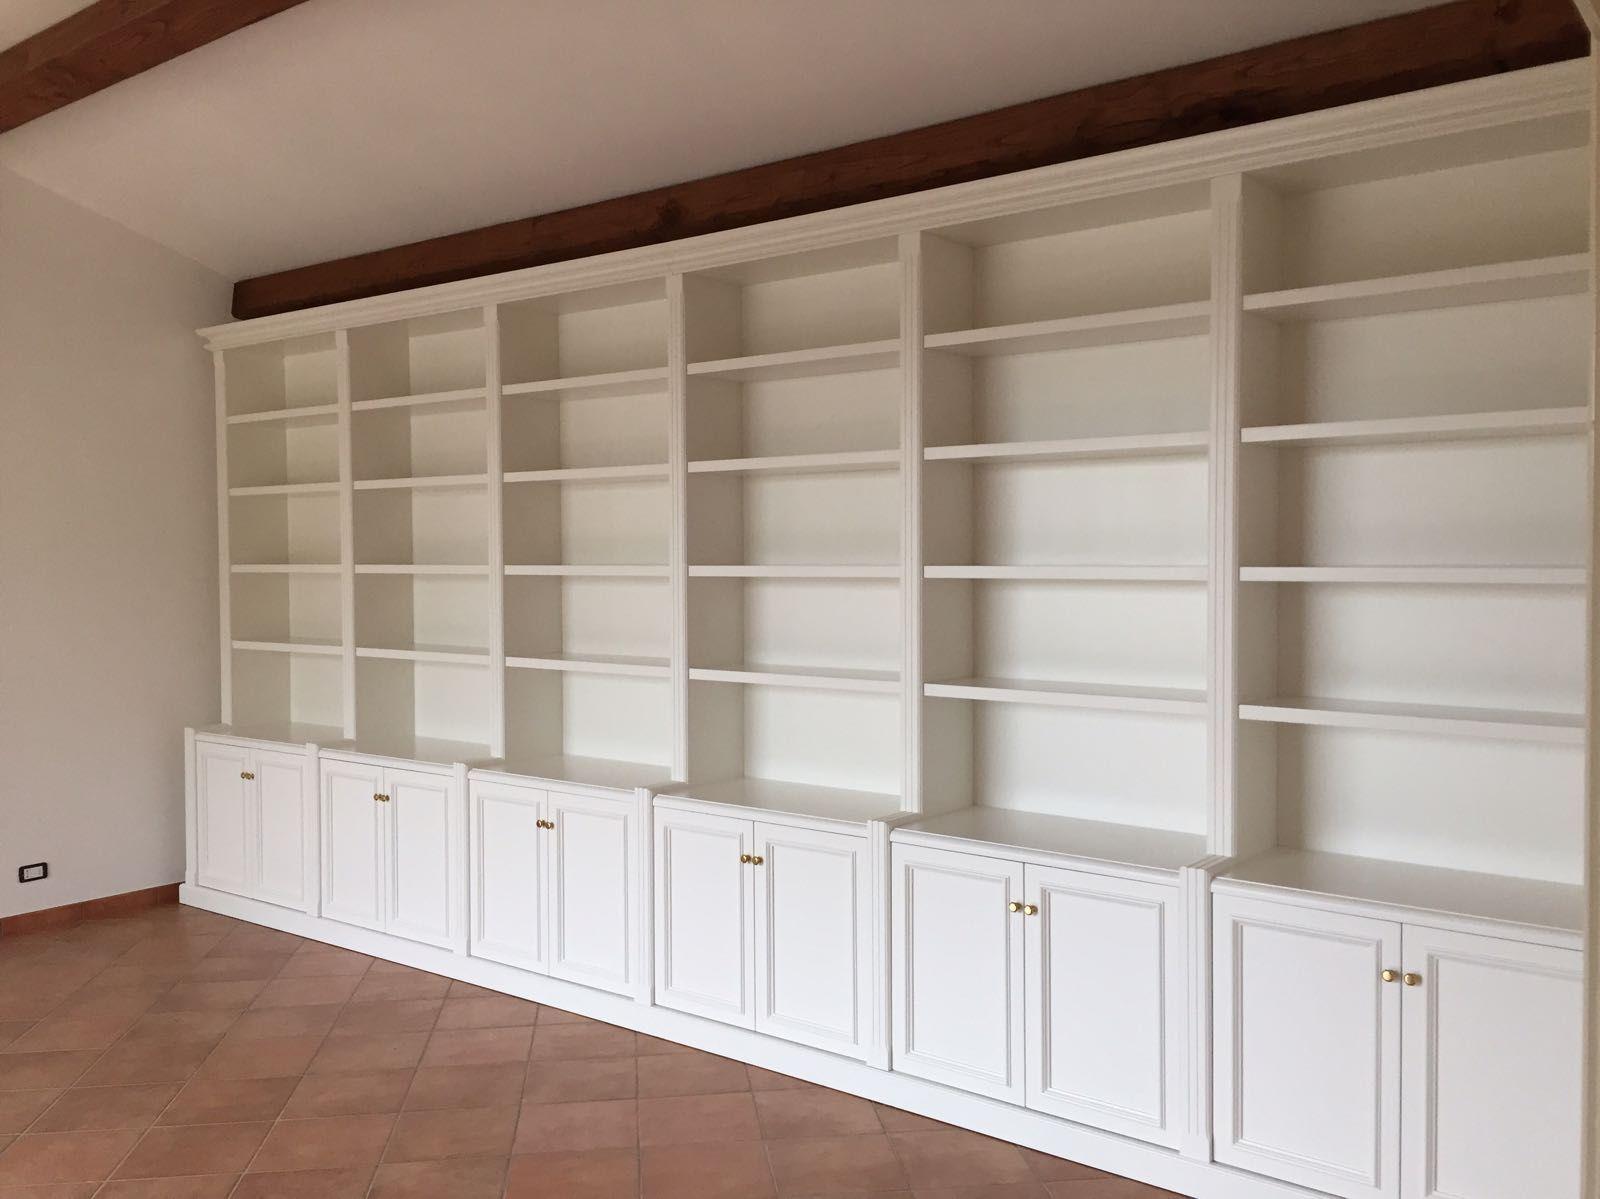 Librerie Componibili Per Mansarda.Librerie In Legno Roma Librerie Home Decor Shelves E Decor